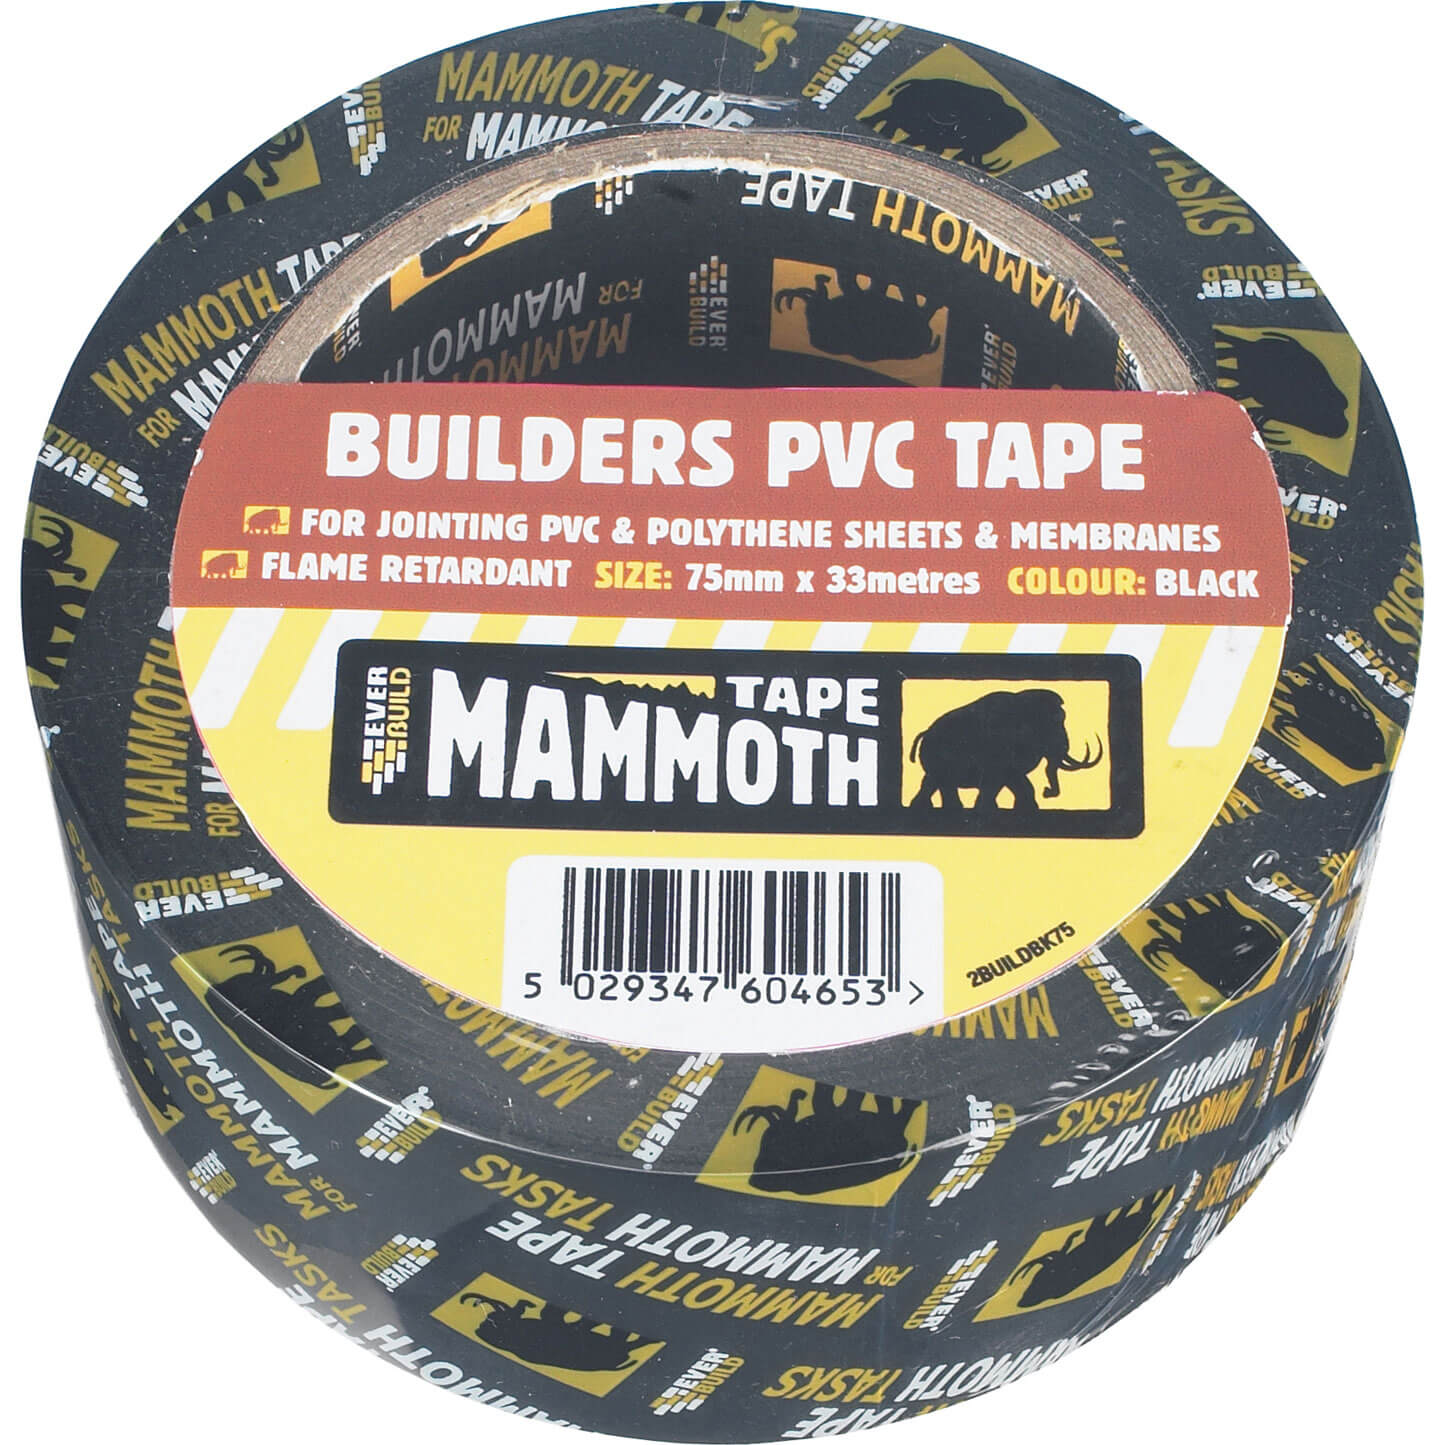 Image of Everbuild Mammoth Builders PVC Black Tape Black 50mm 33m